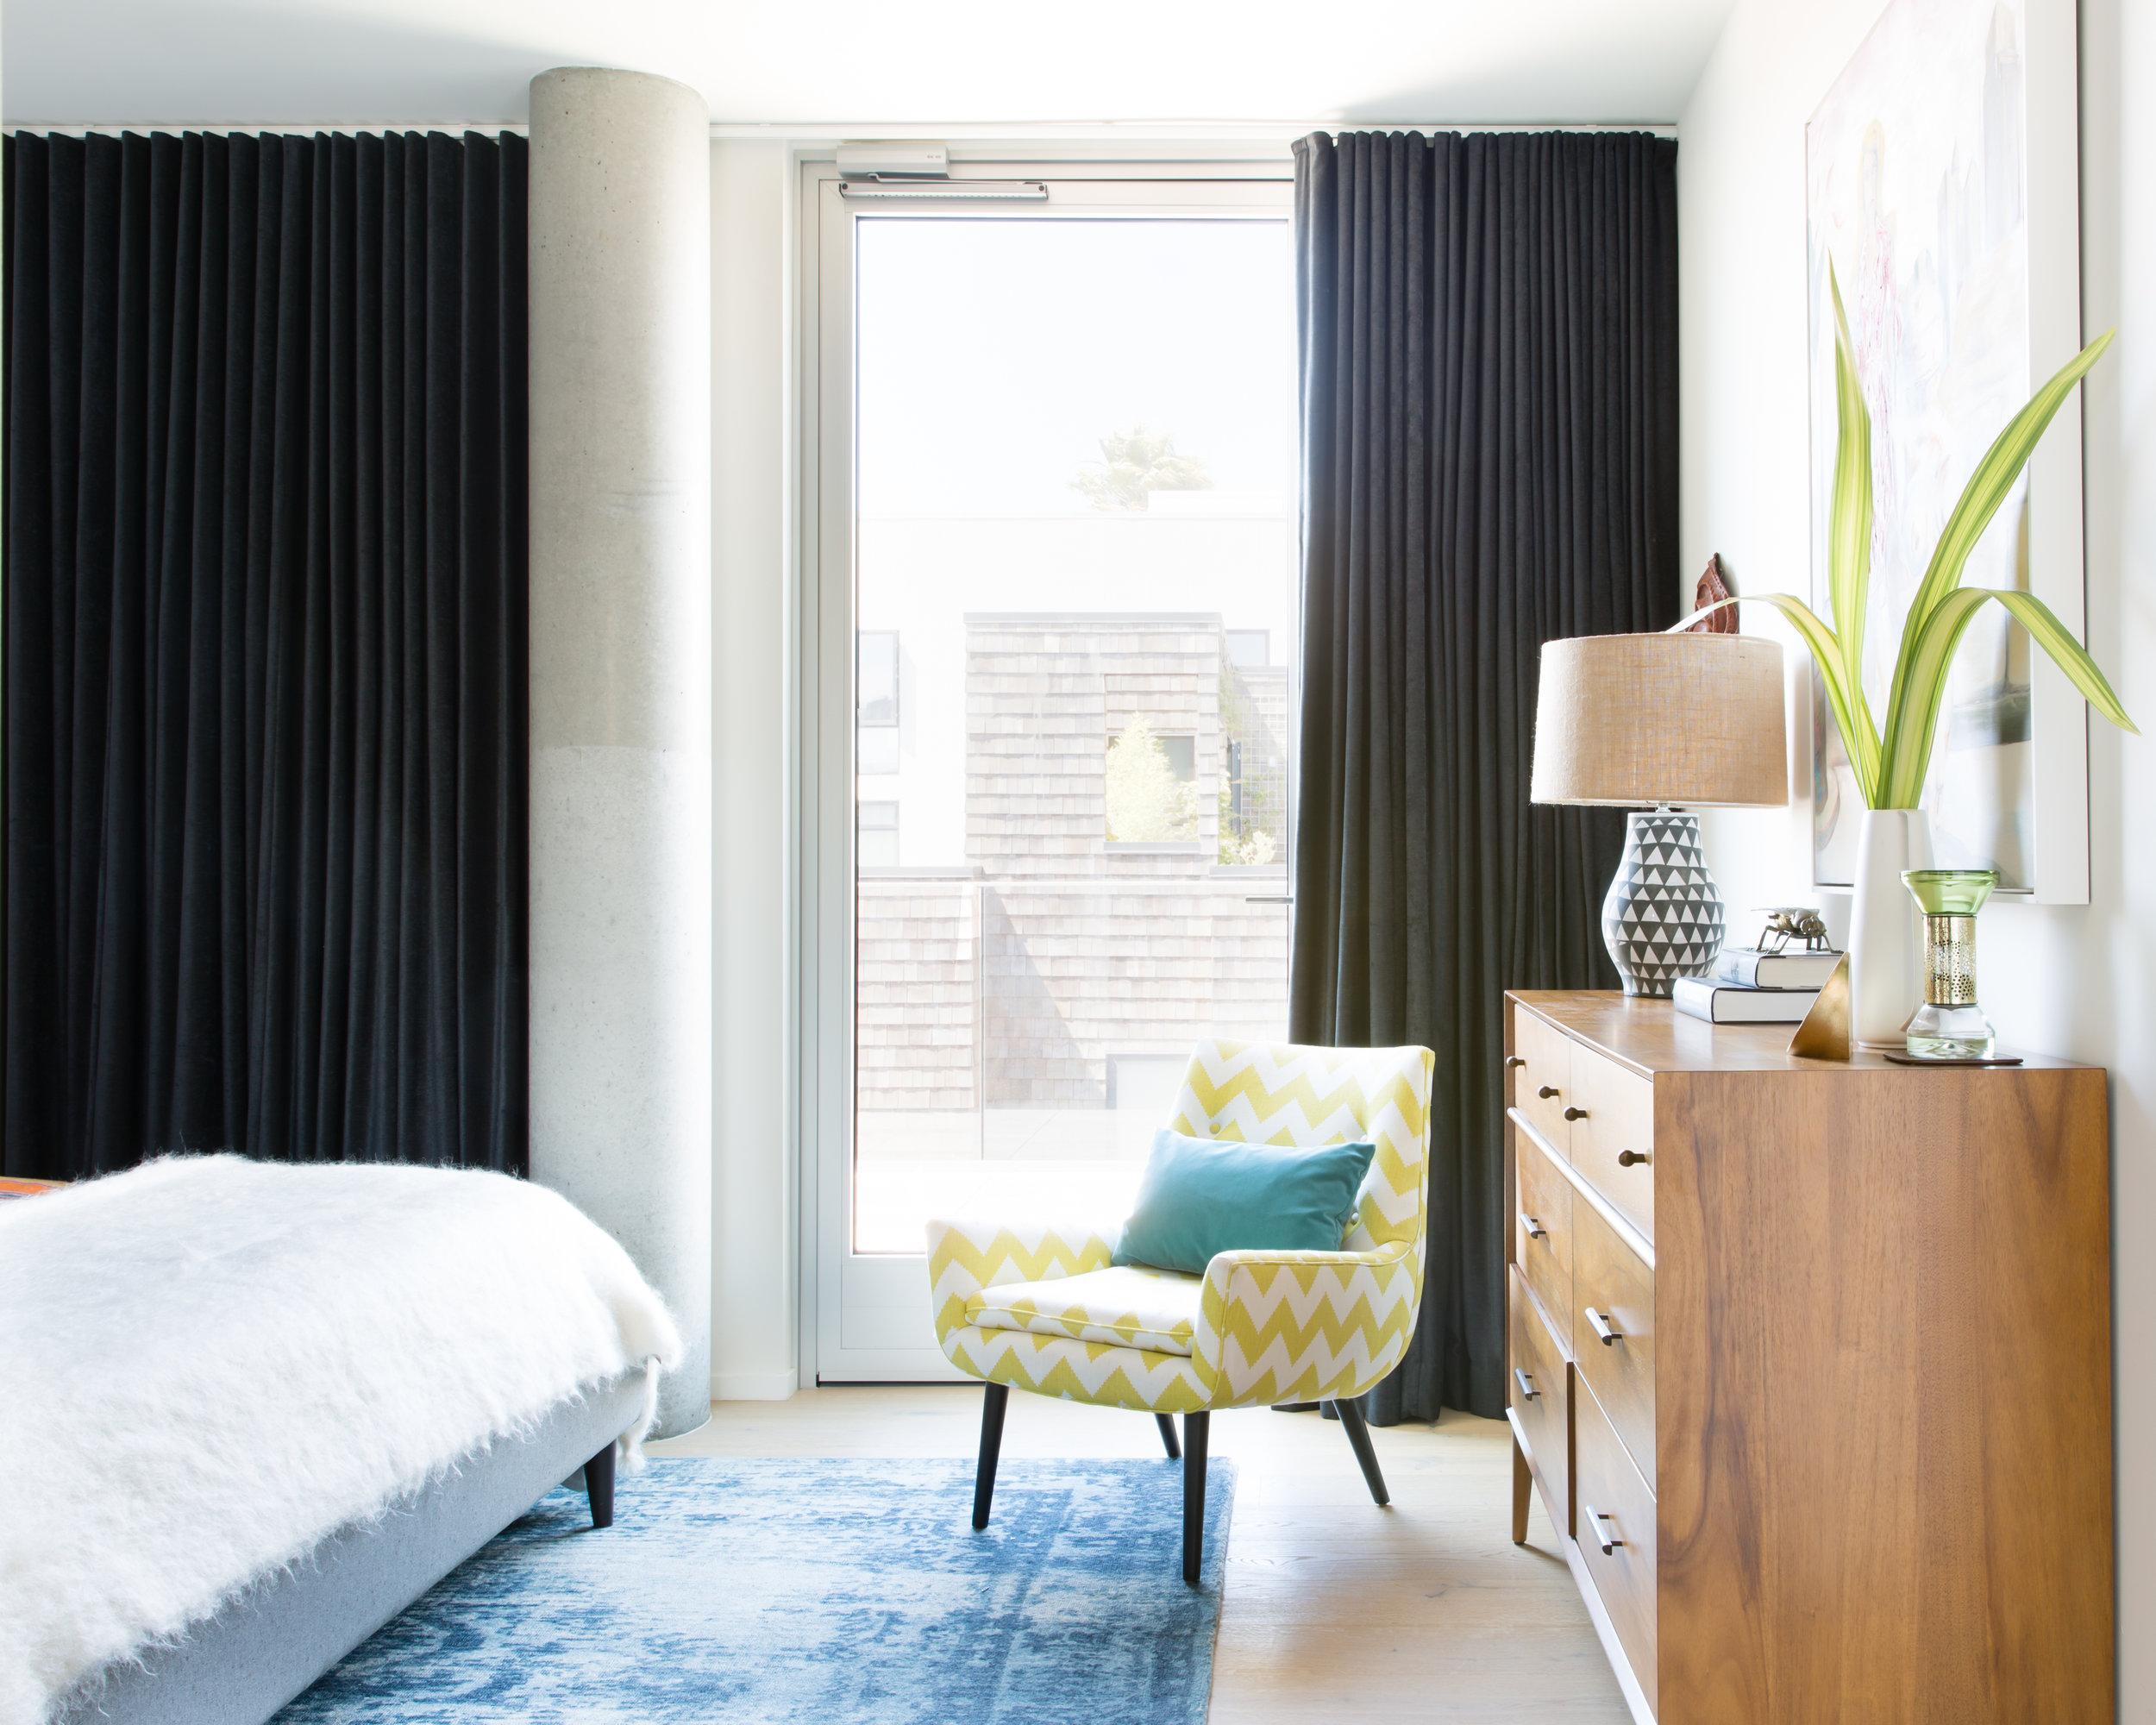 20 RBD Hayes Valley Hip Haven - Master Bedroom 2.jpg